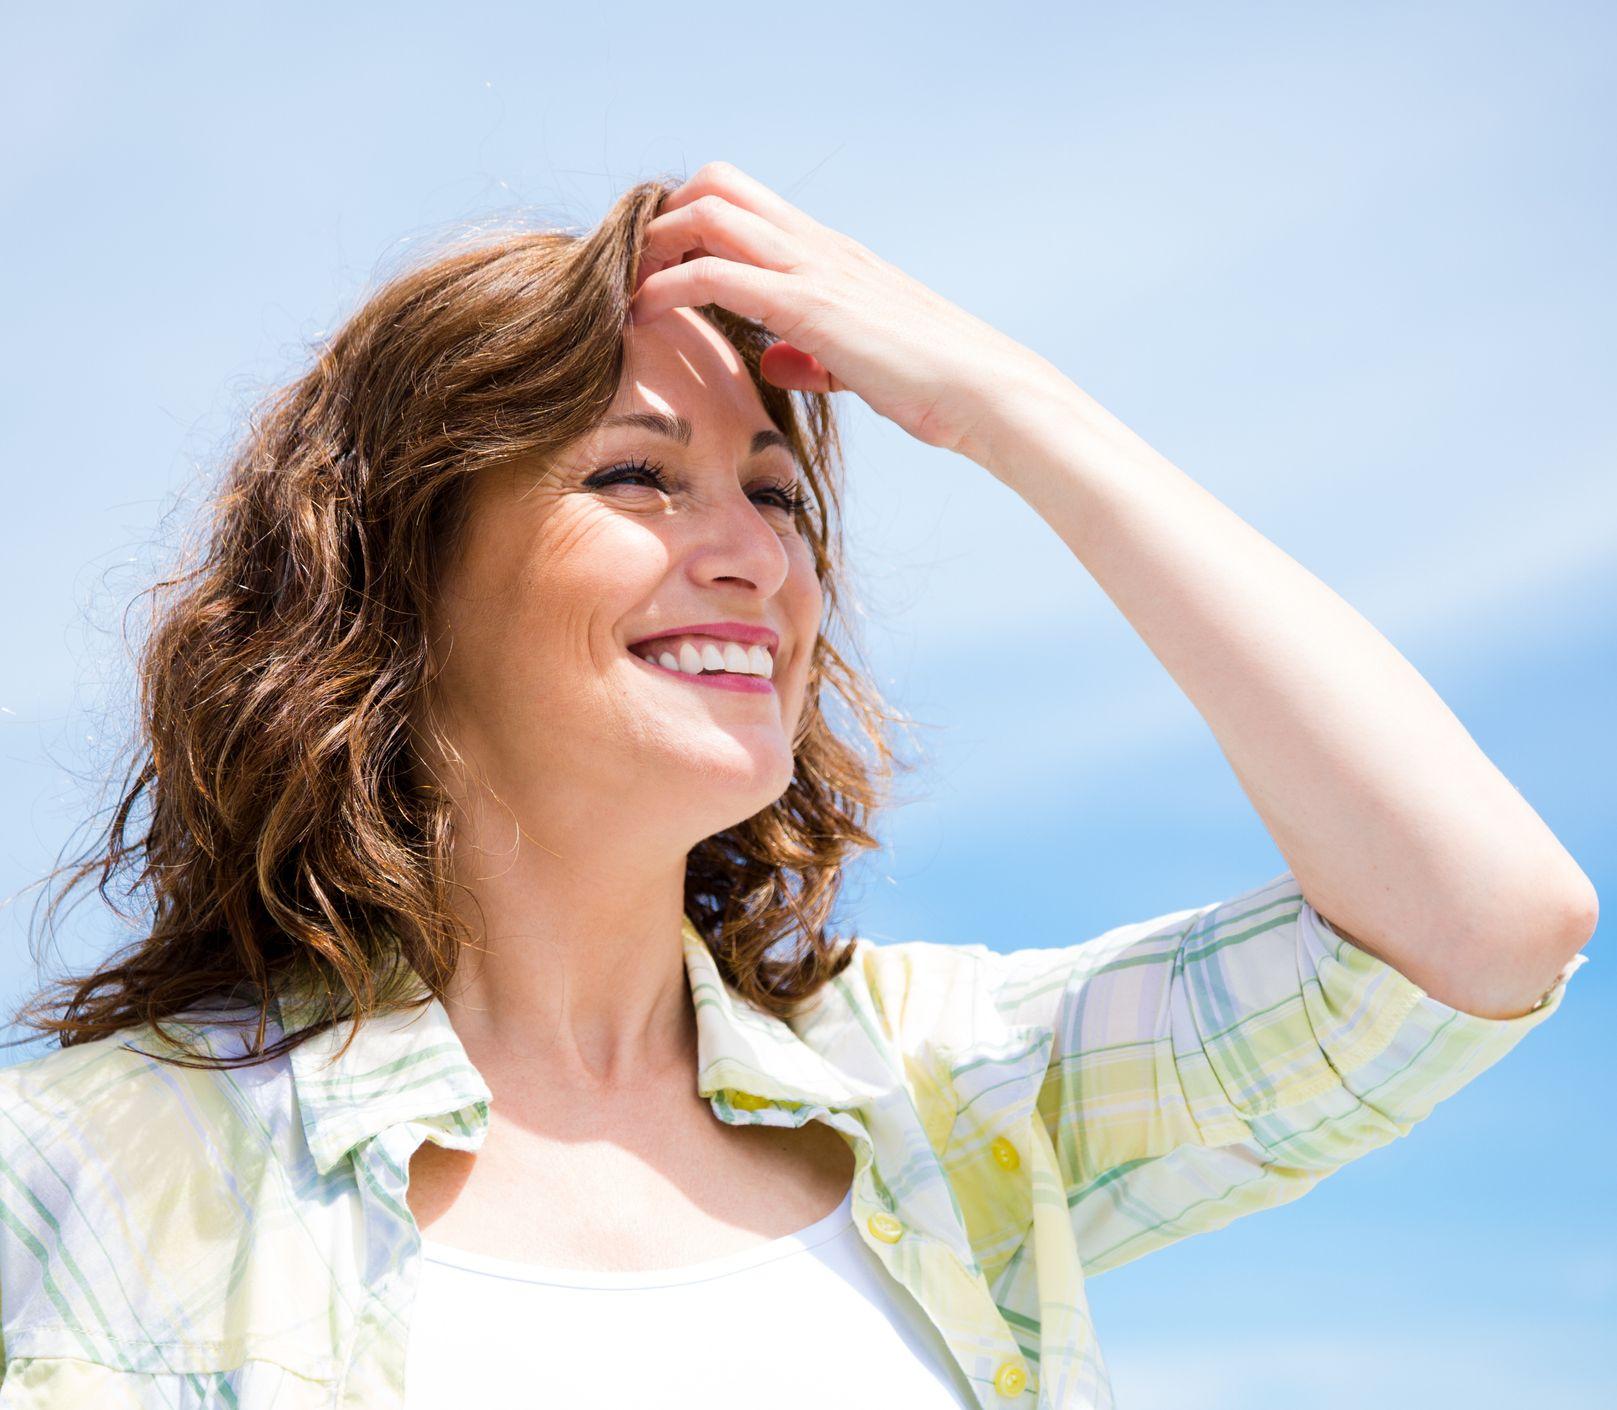 Pripravte svoju pokožku na slnko: Doprajte jej tieto potraviny